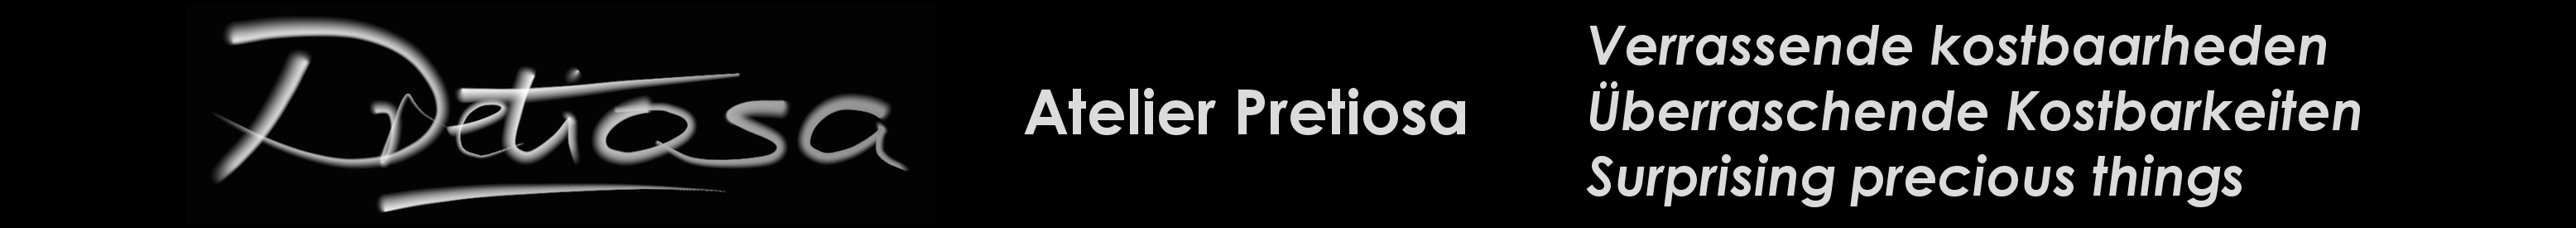 Atelier Pretiosa